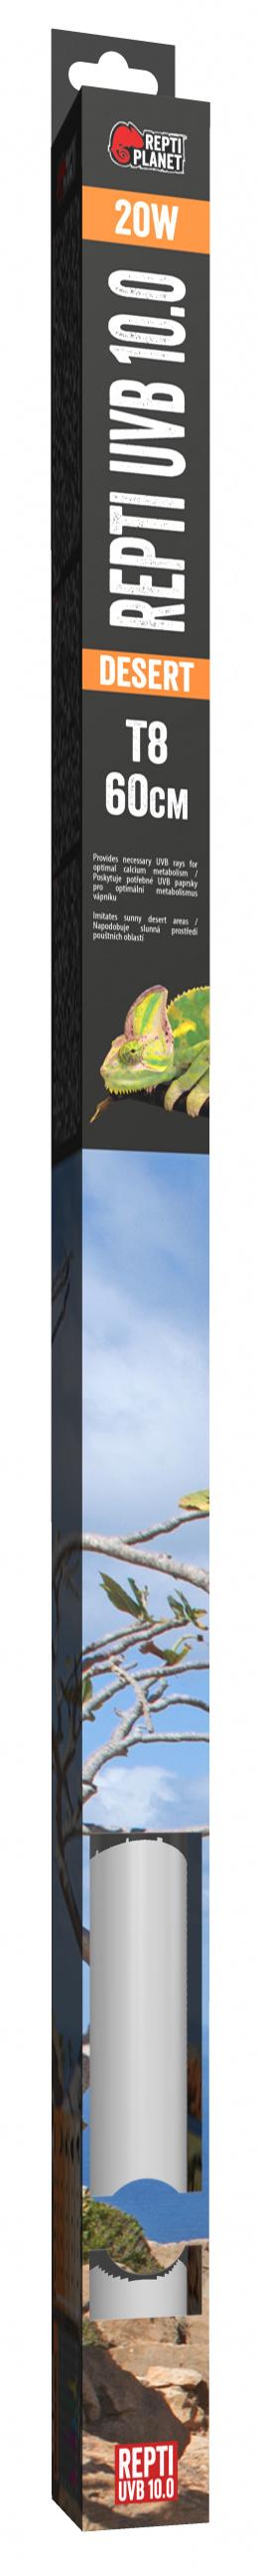 Лампа для террариумов - ReptiPlanet Repti T8 UVB 10.0 20W, 60 см